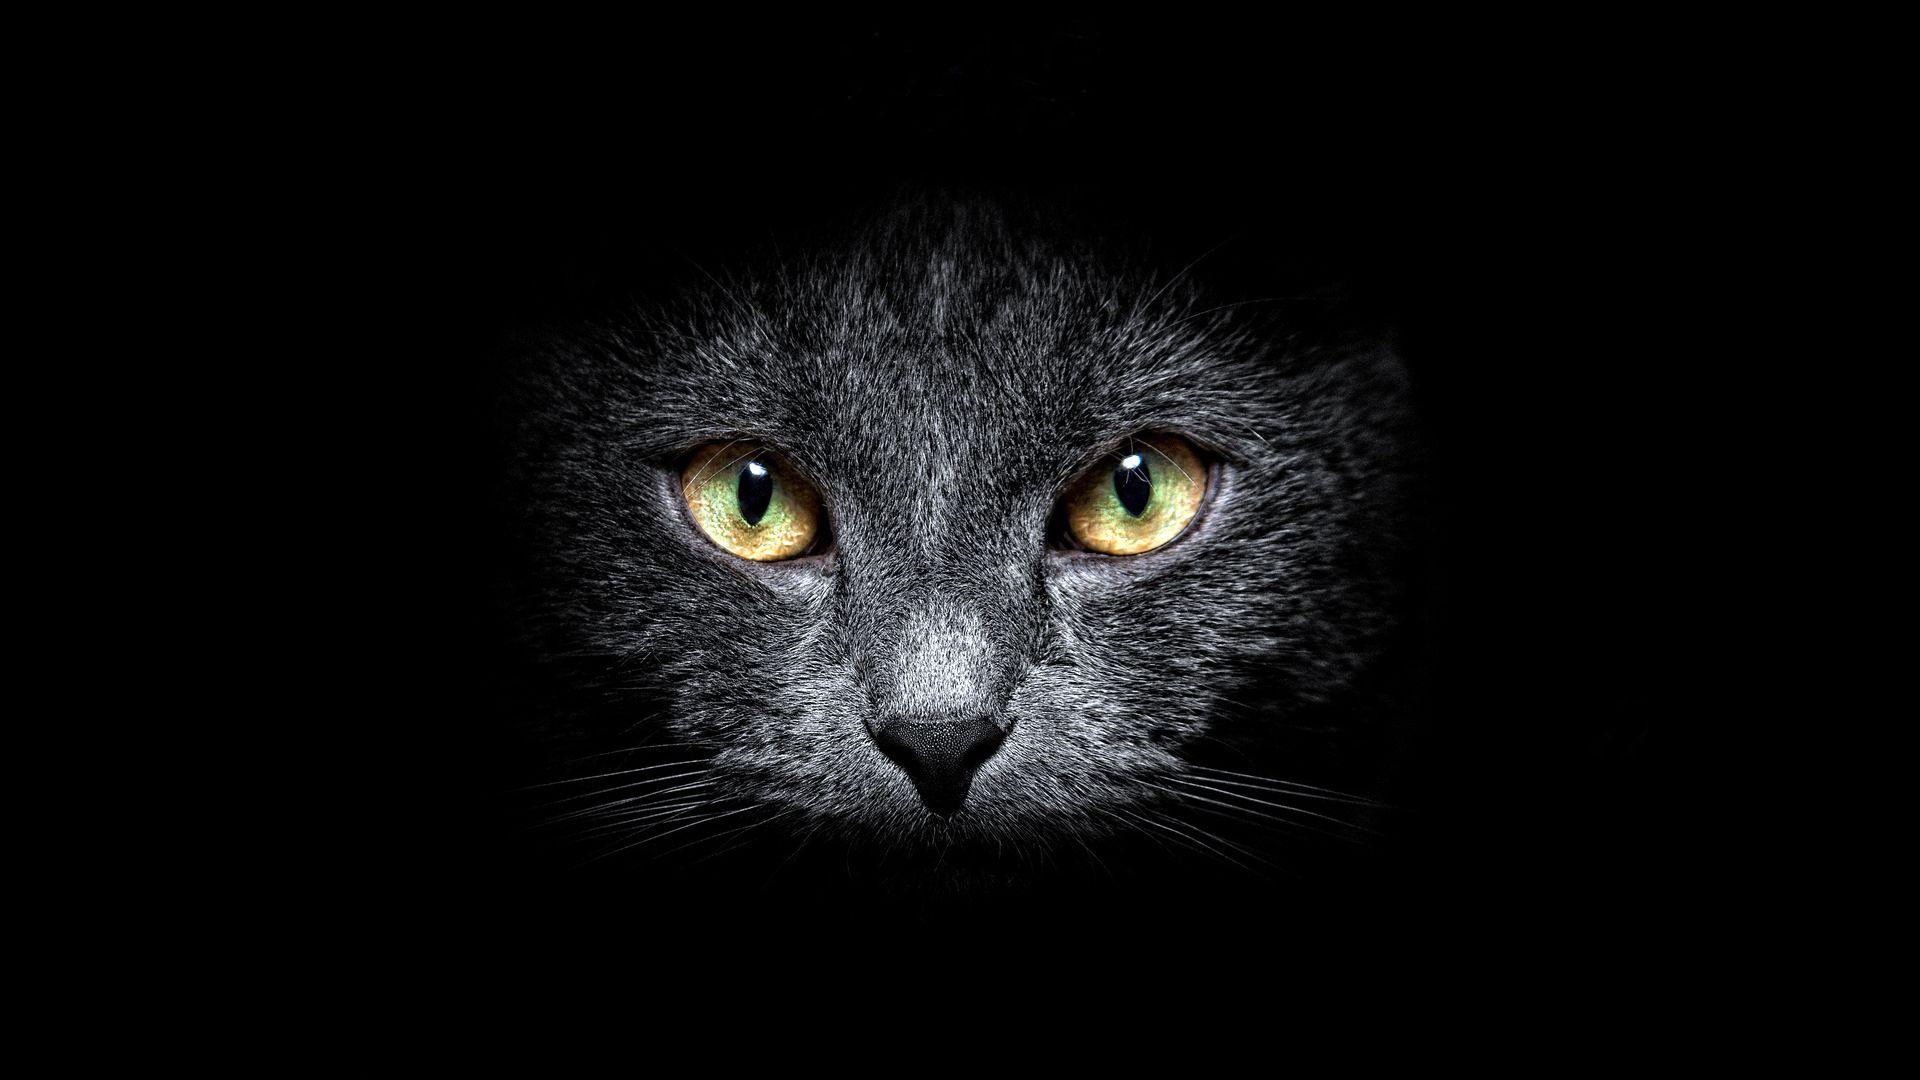 Pin By نور الفجر On Fluff N Stuff Cats Crazy Cats Black Cat